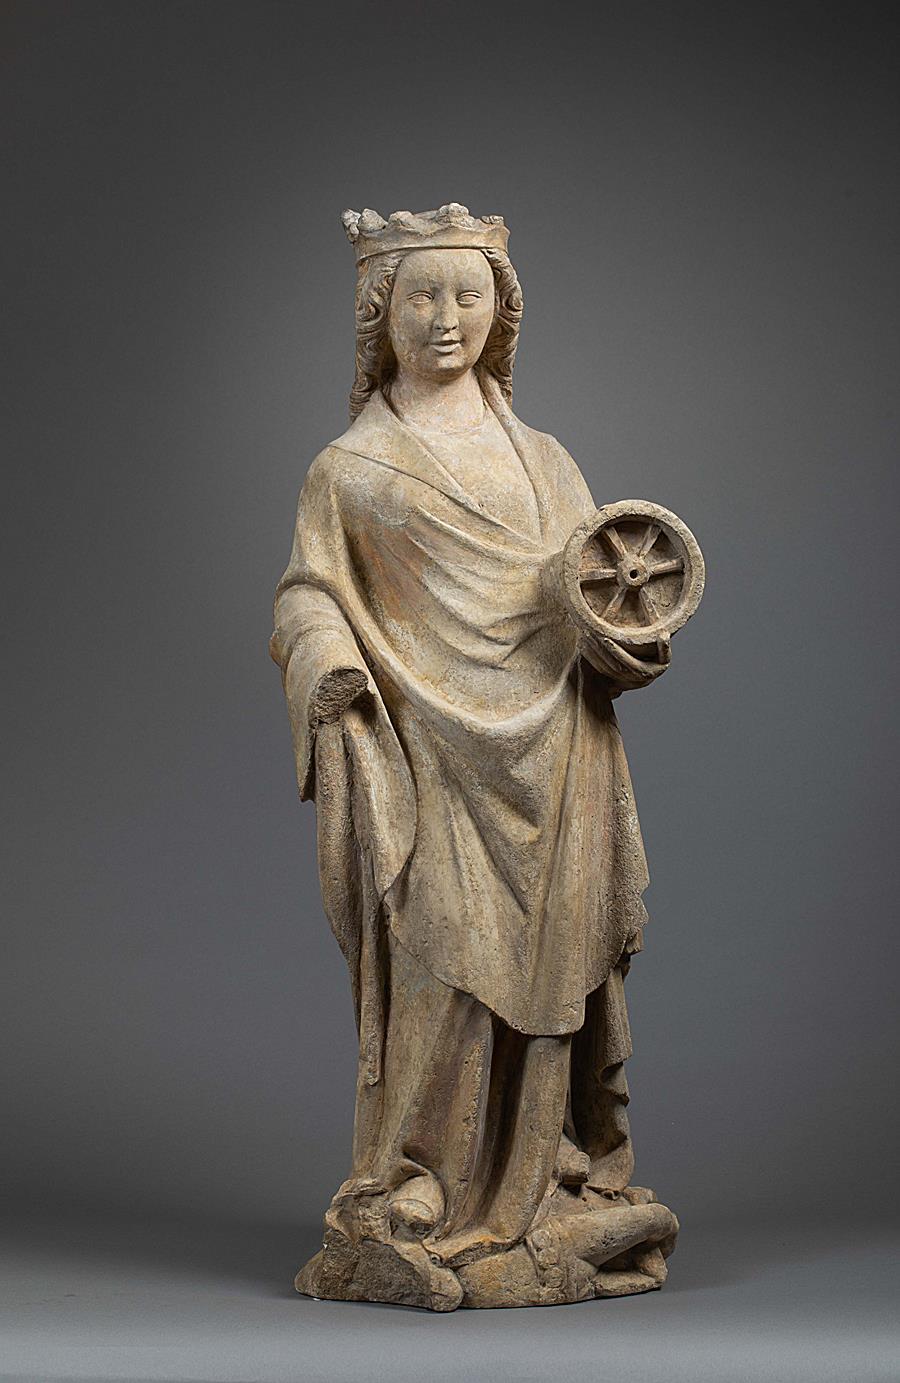 FRENCH GOTHIC FIGURE OF SAINT CATHERINE OF ALEXANDRIA